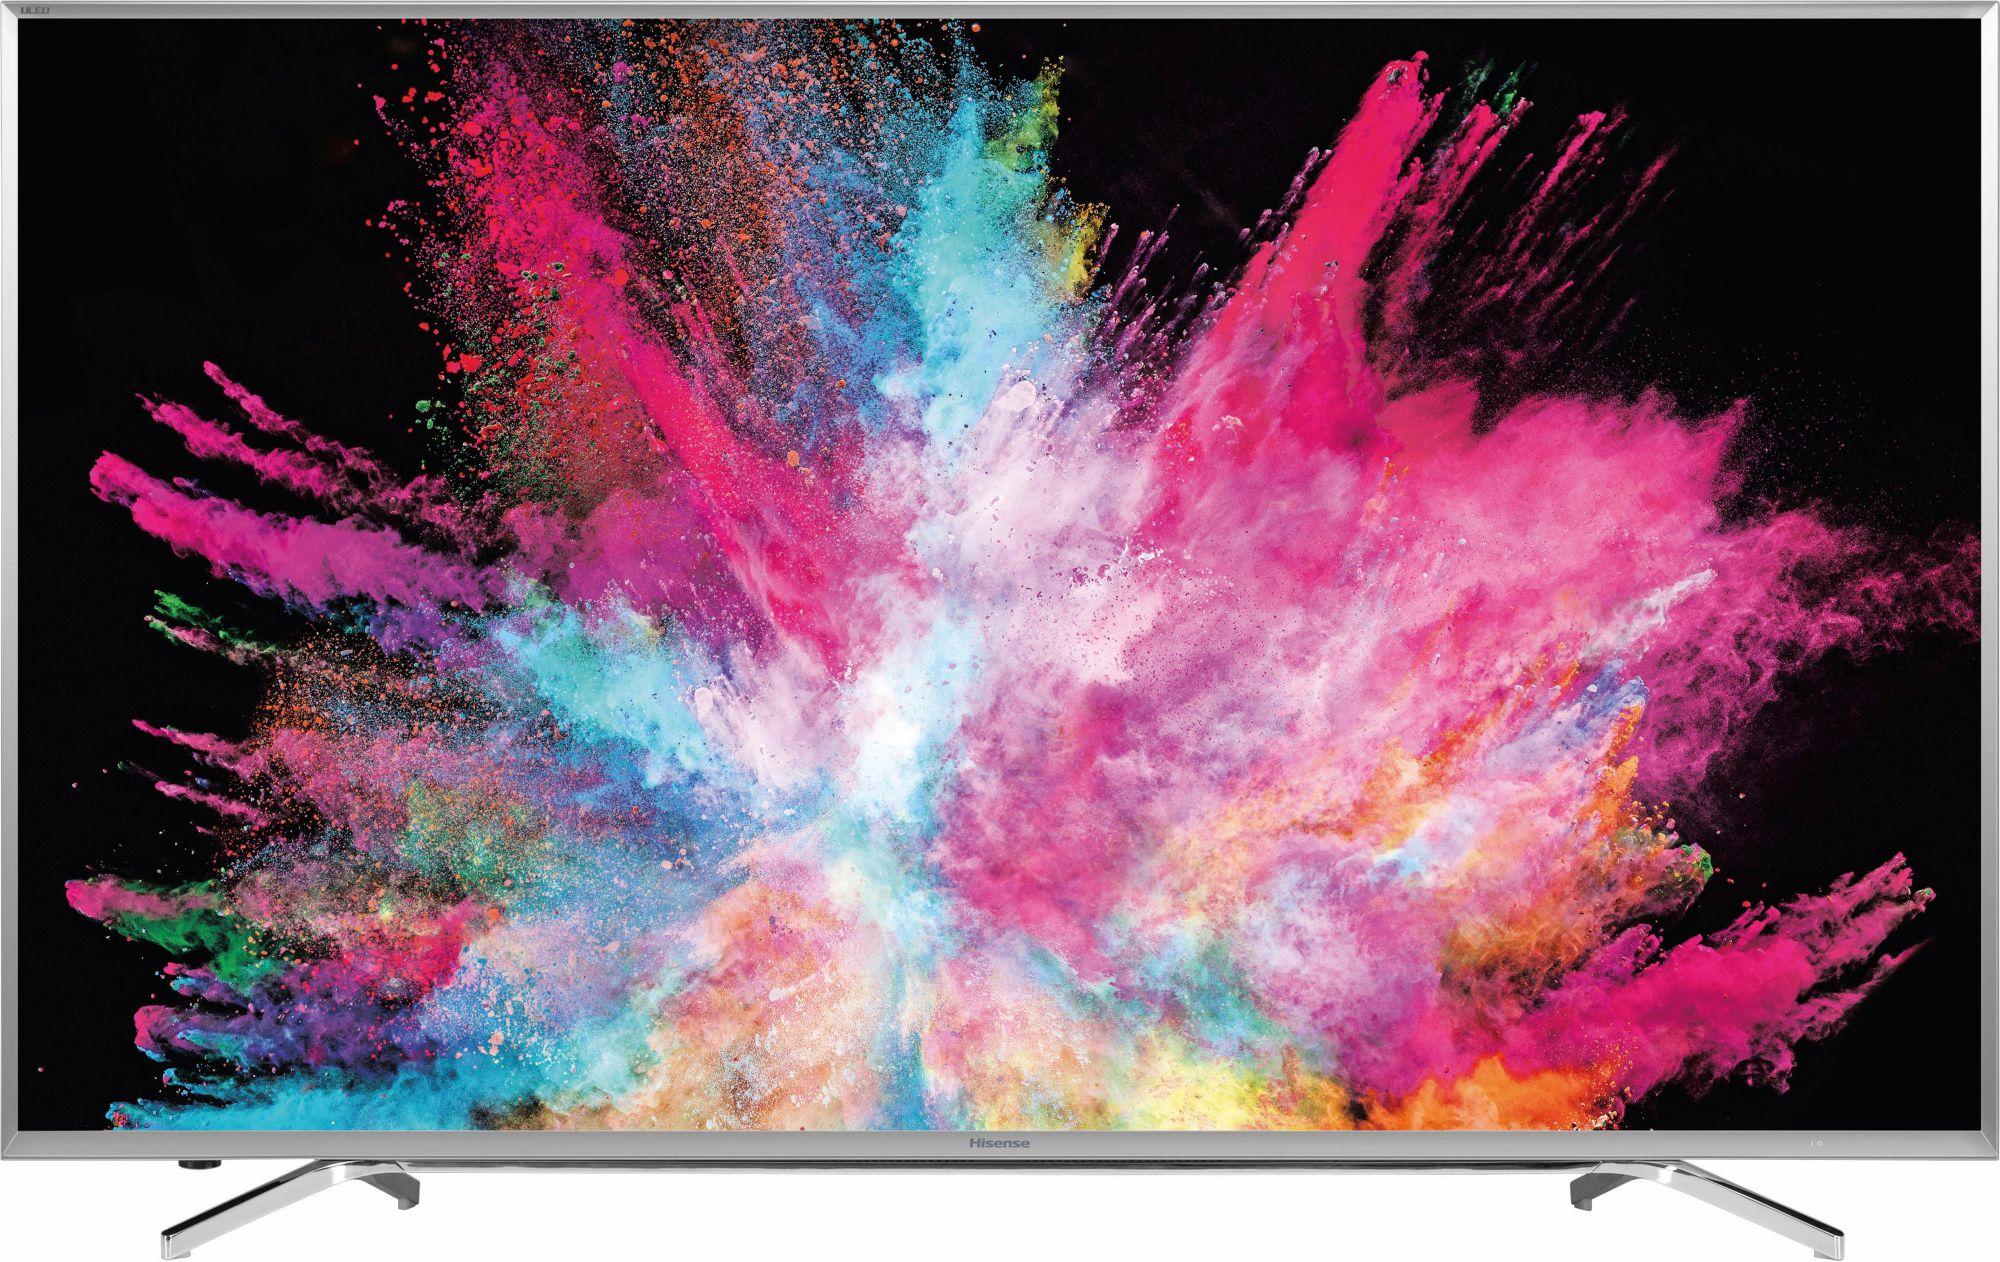 HISENSE Hisense H65M7000, LED Fernseher, 163 cm (65 Zoll), 2160p (4K Ultra HD), Smart-TV